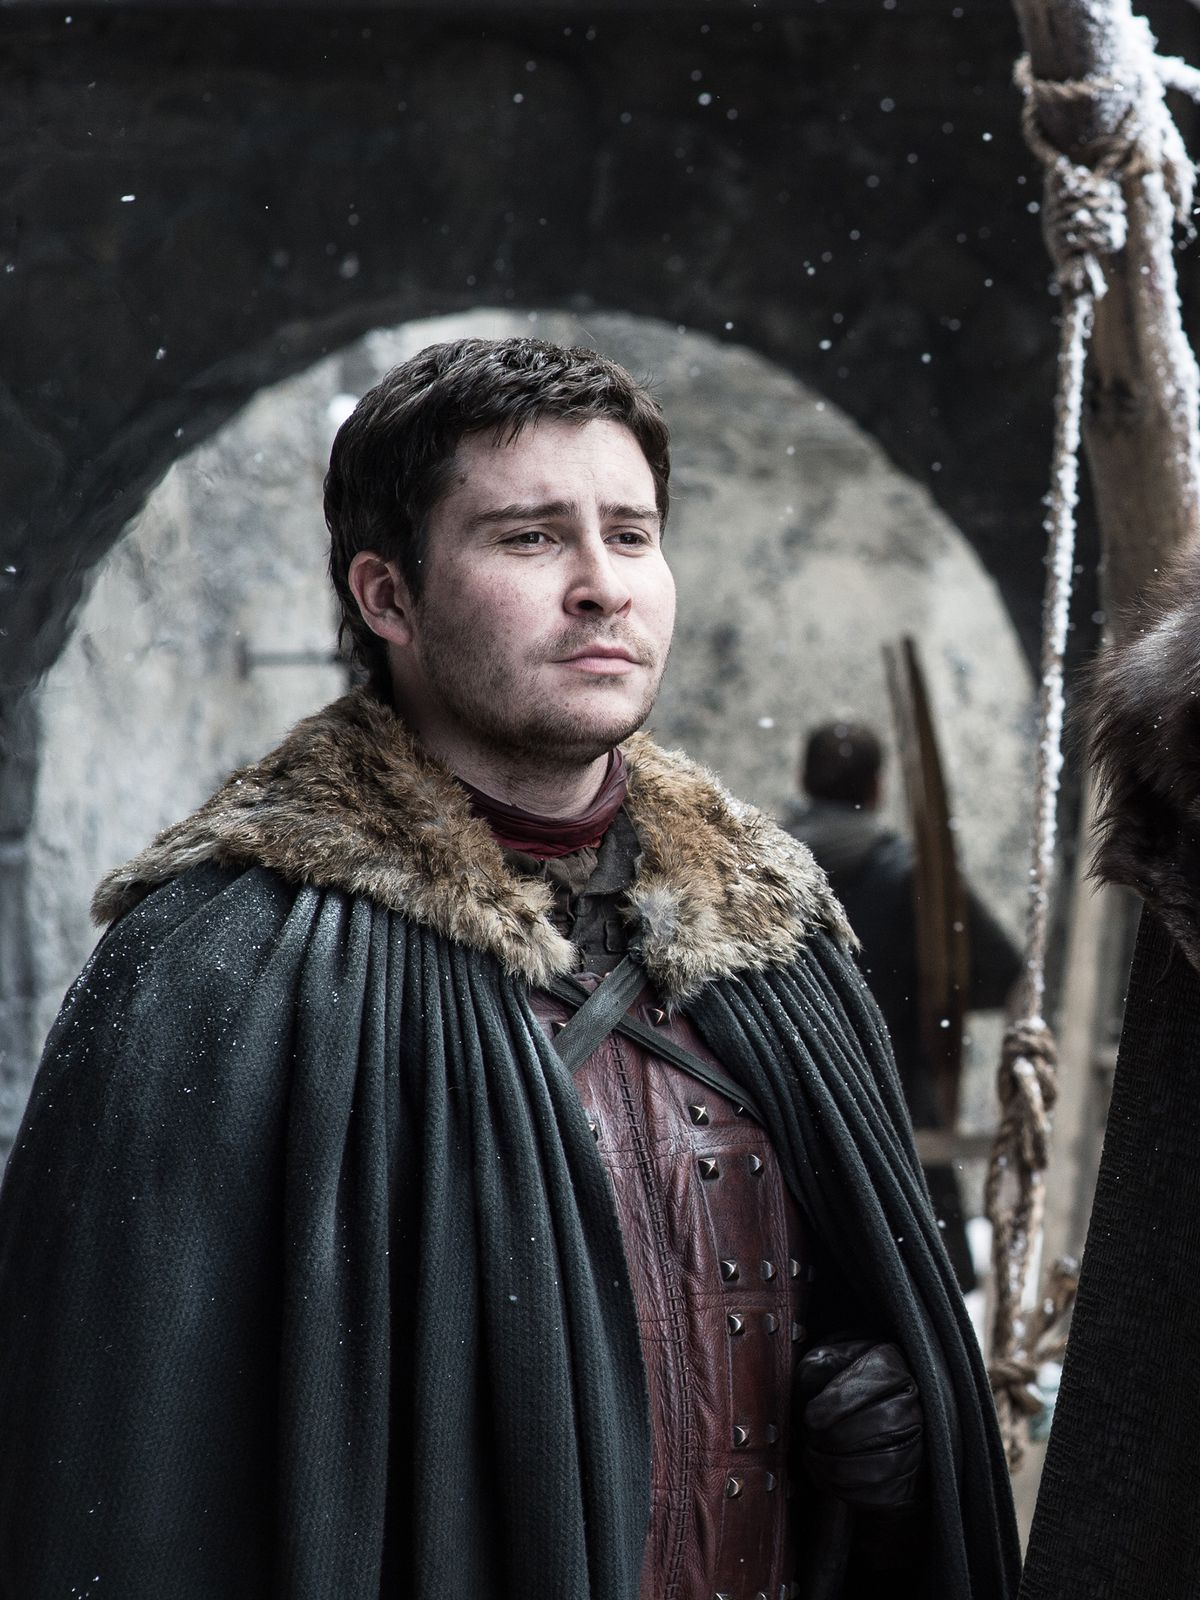 Game of Thrones 704 - Podrick Payne